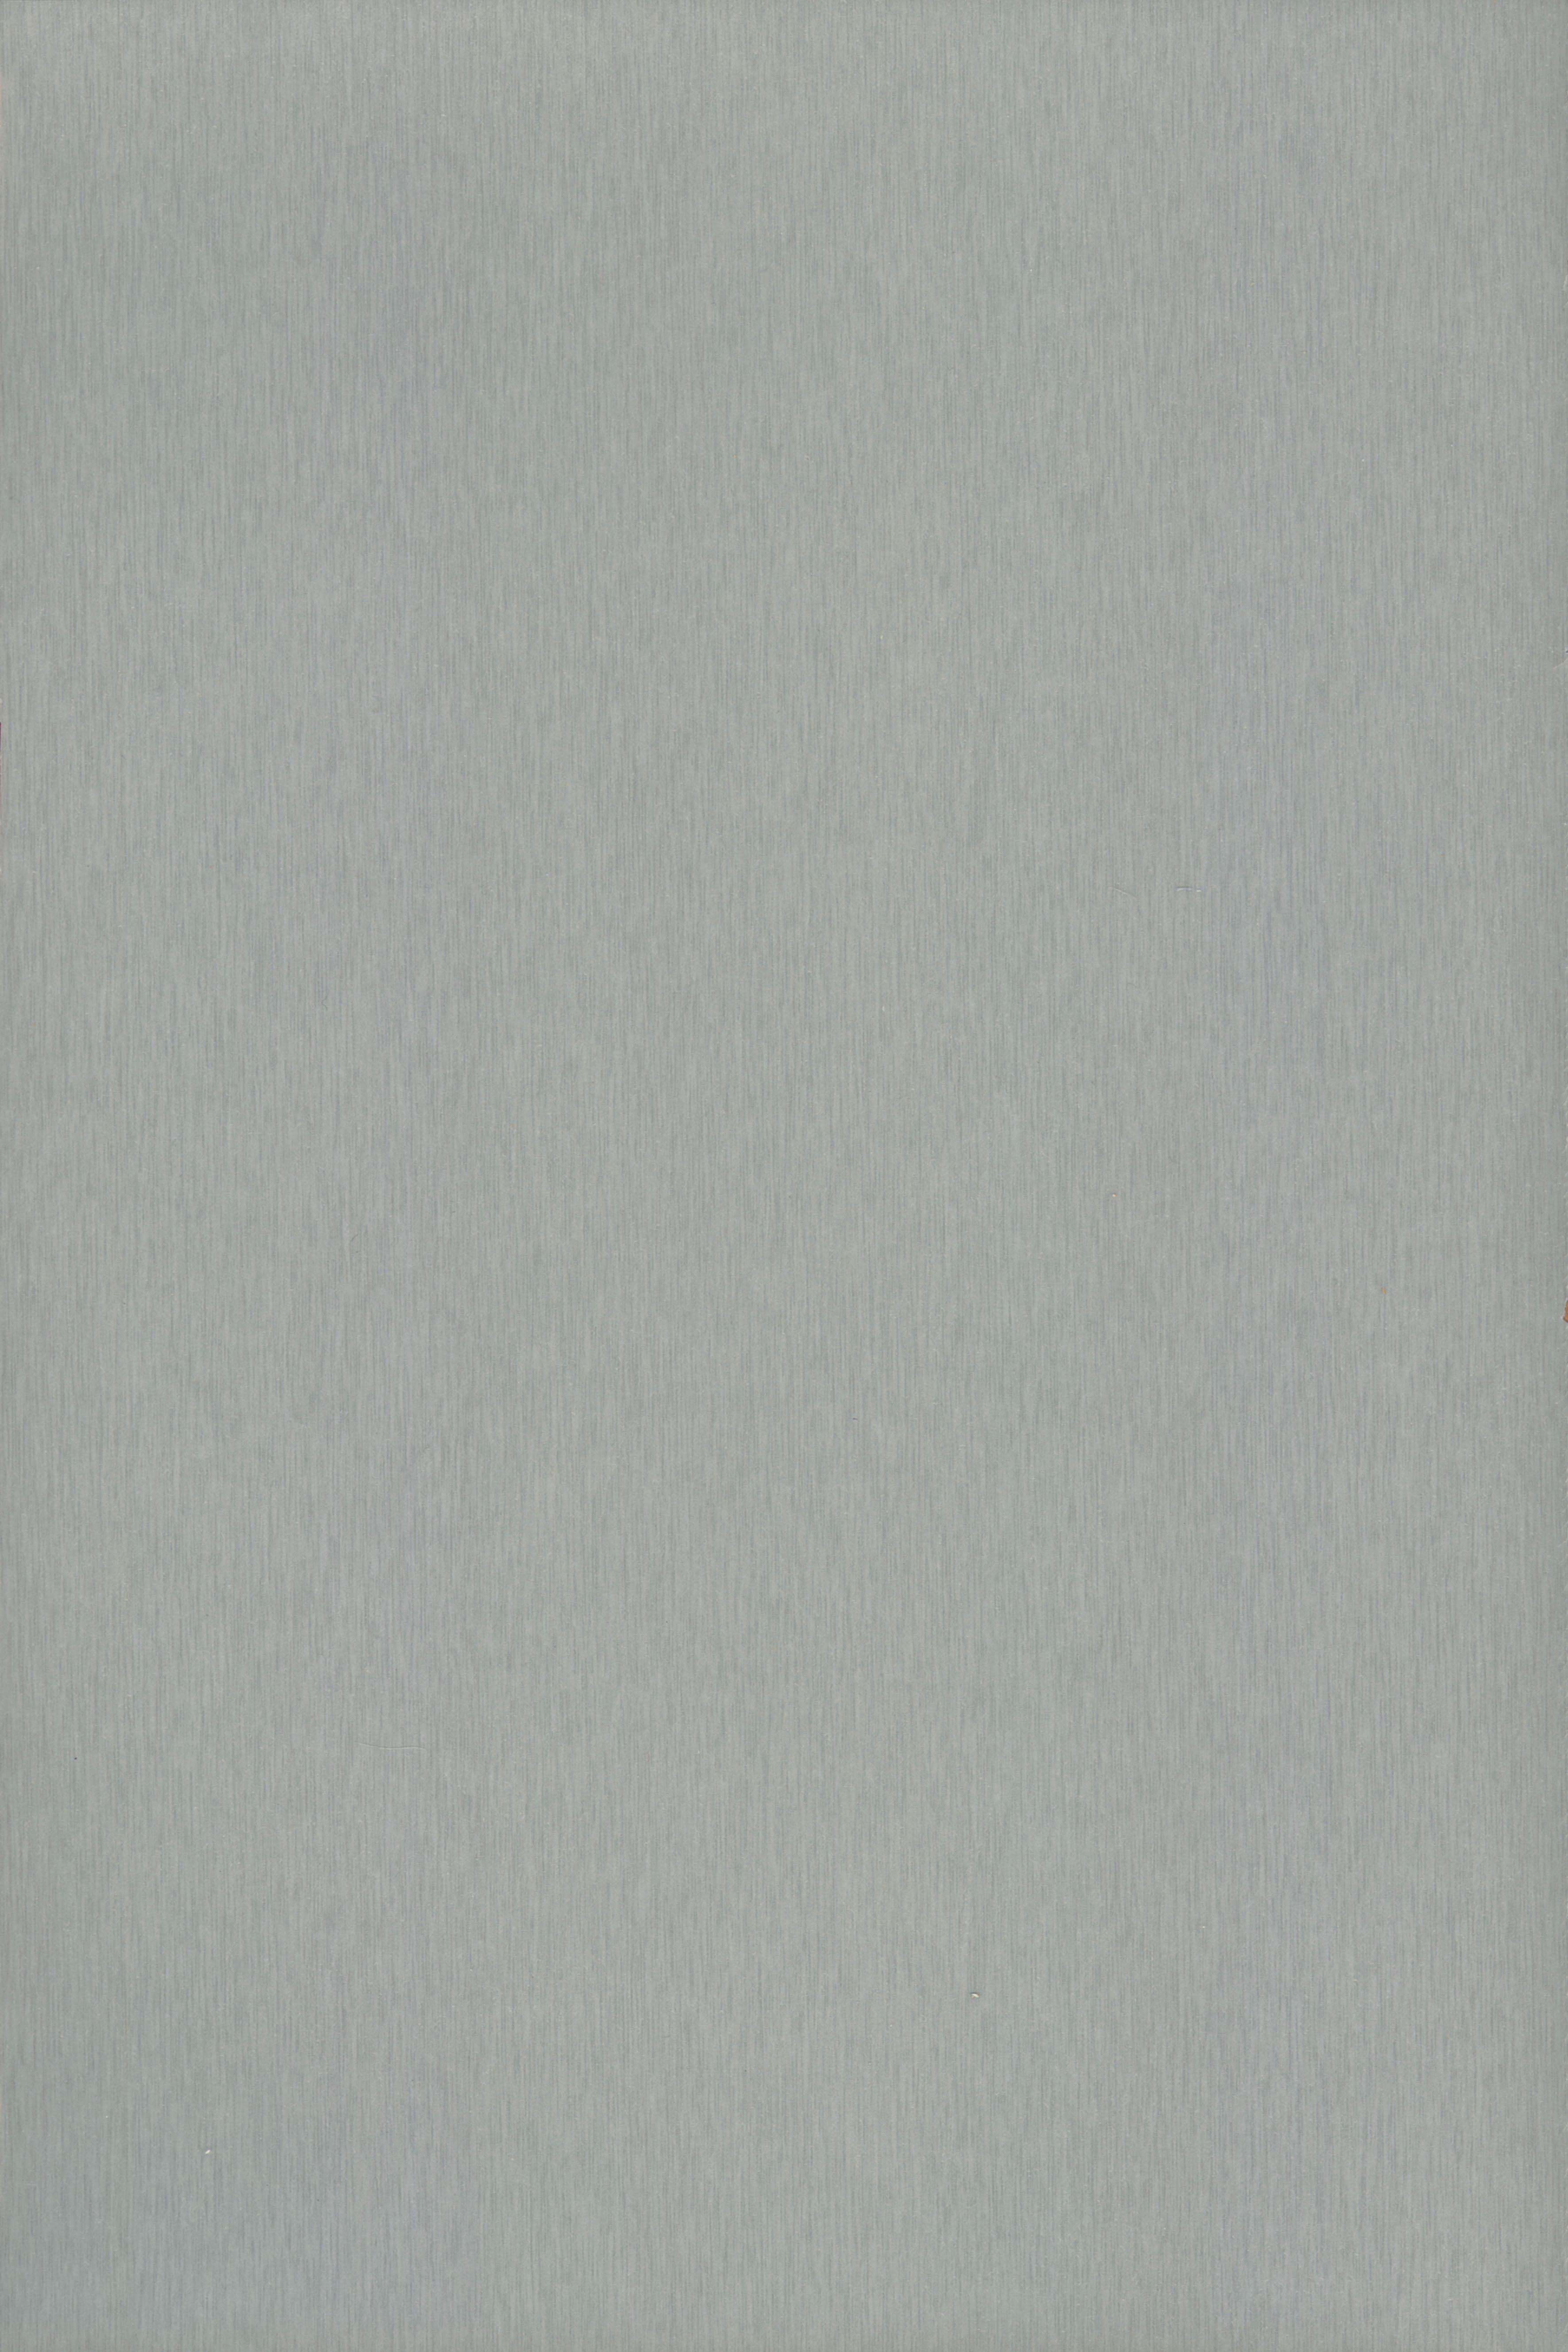 201-fs24